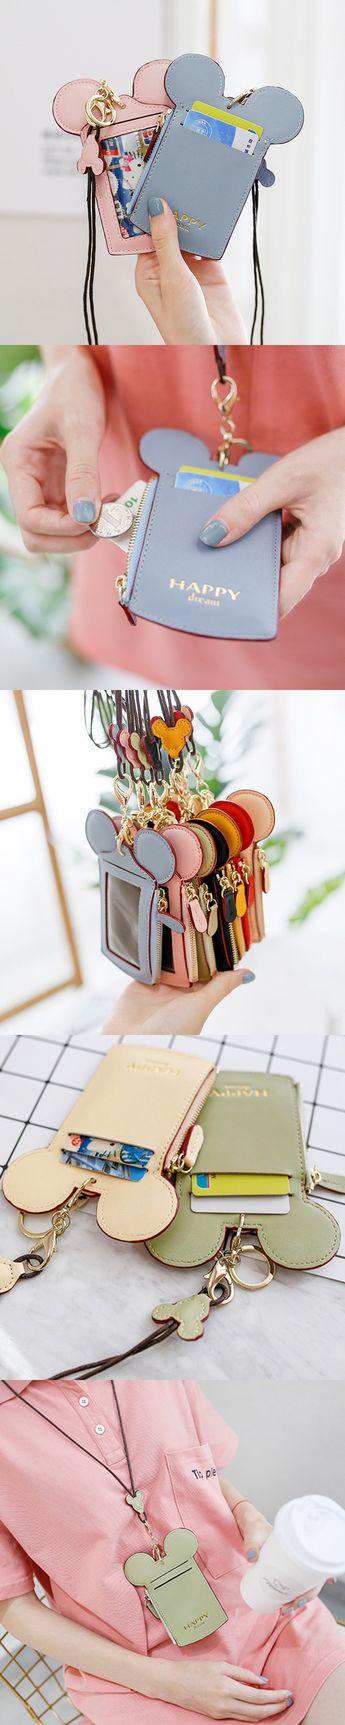 US$8.99   Women Cute Animal Shap Card Holder Wallet Purse Neck Bag